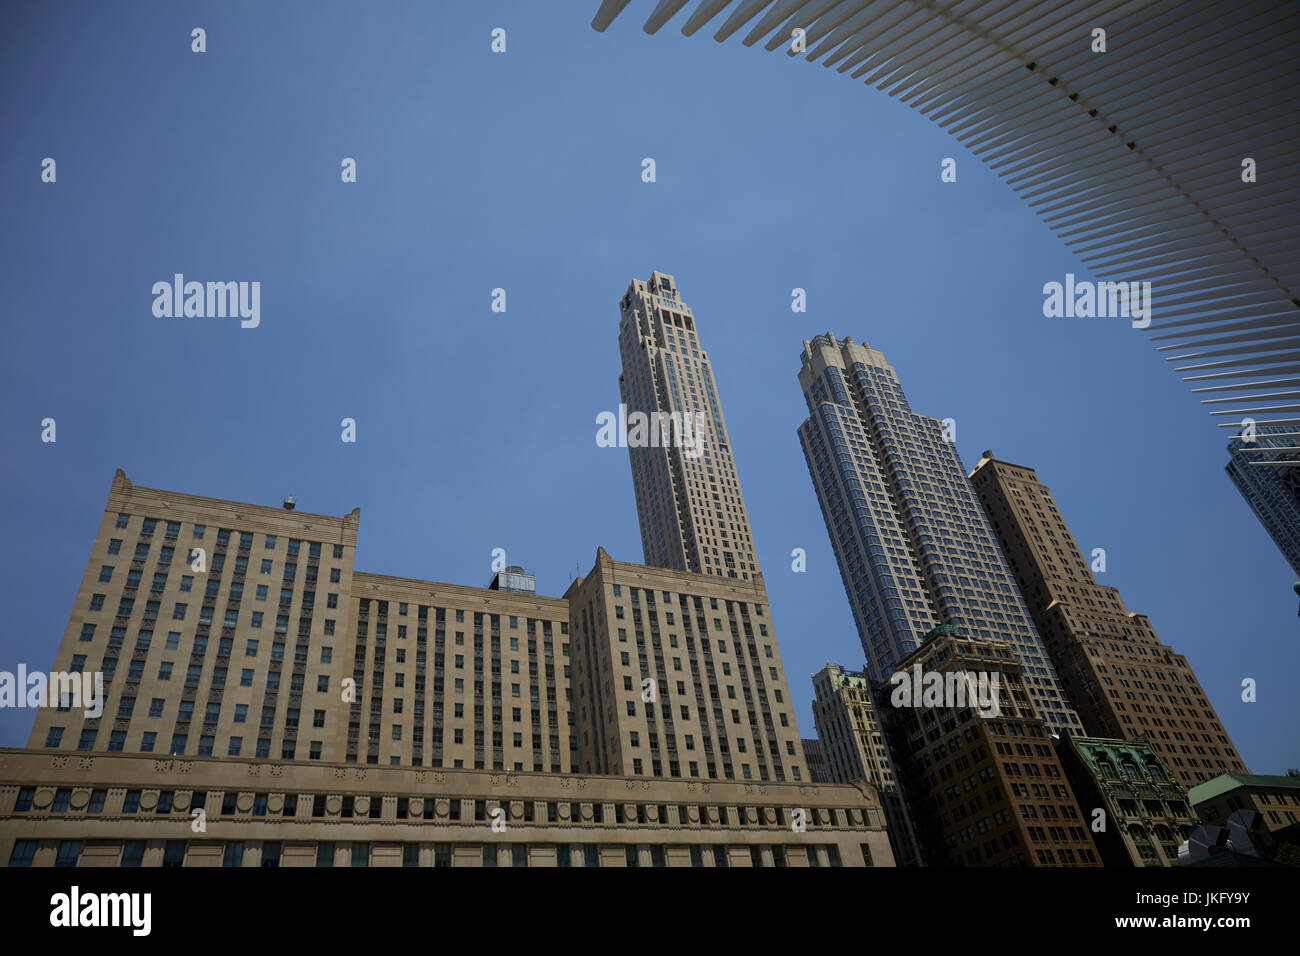 New York City, Manhattan, United States Westfield World Trade Center shopping center  World Trade Center frames - Stock Image